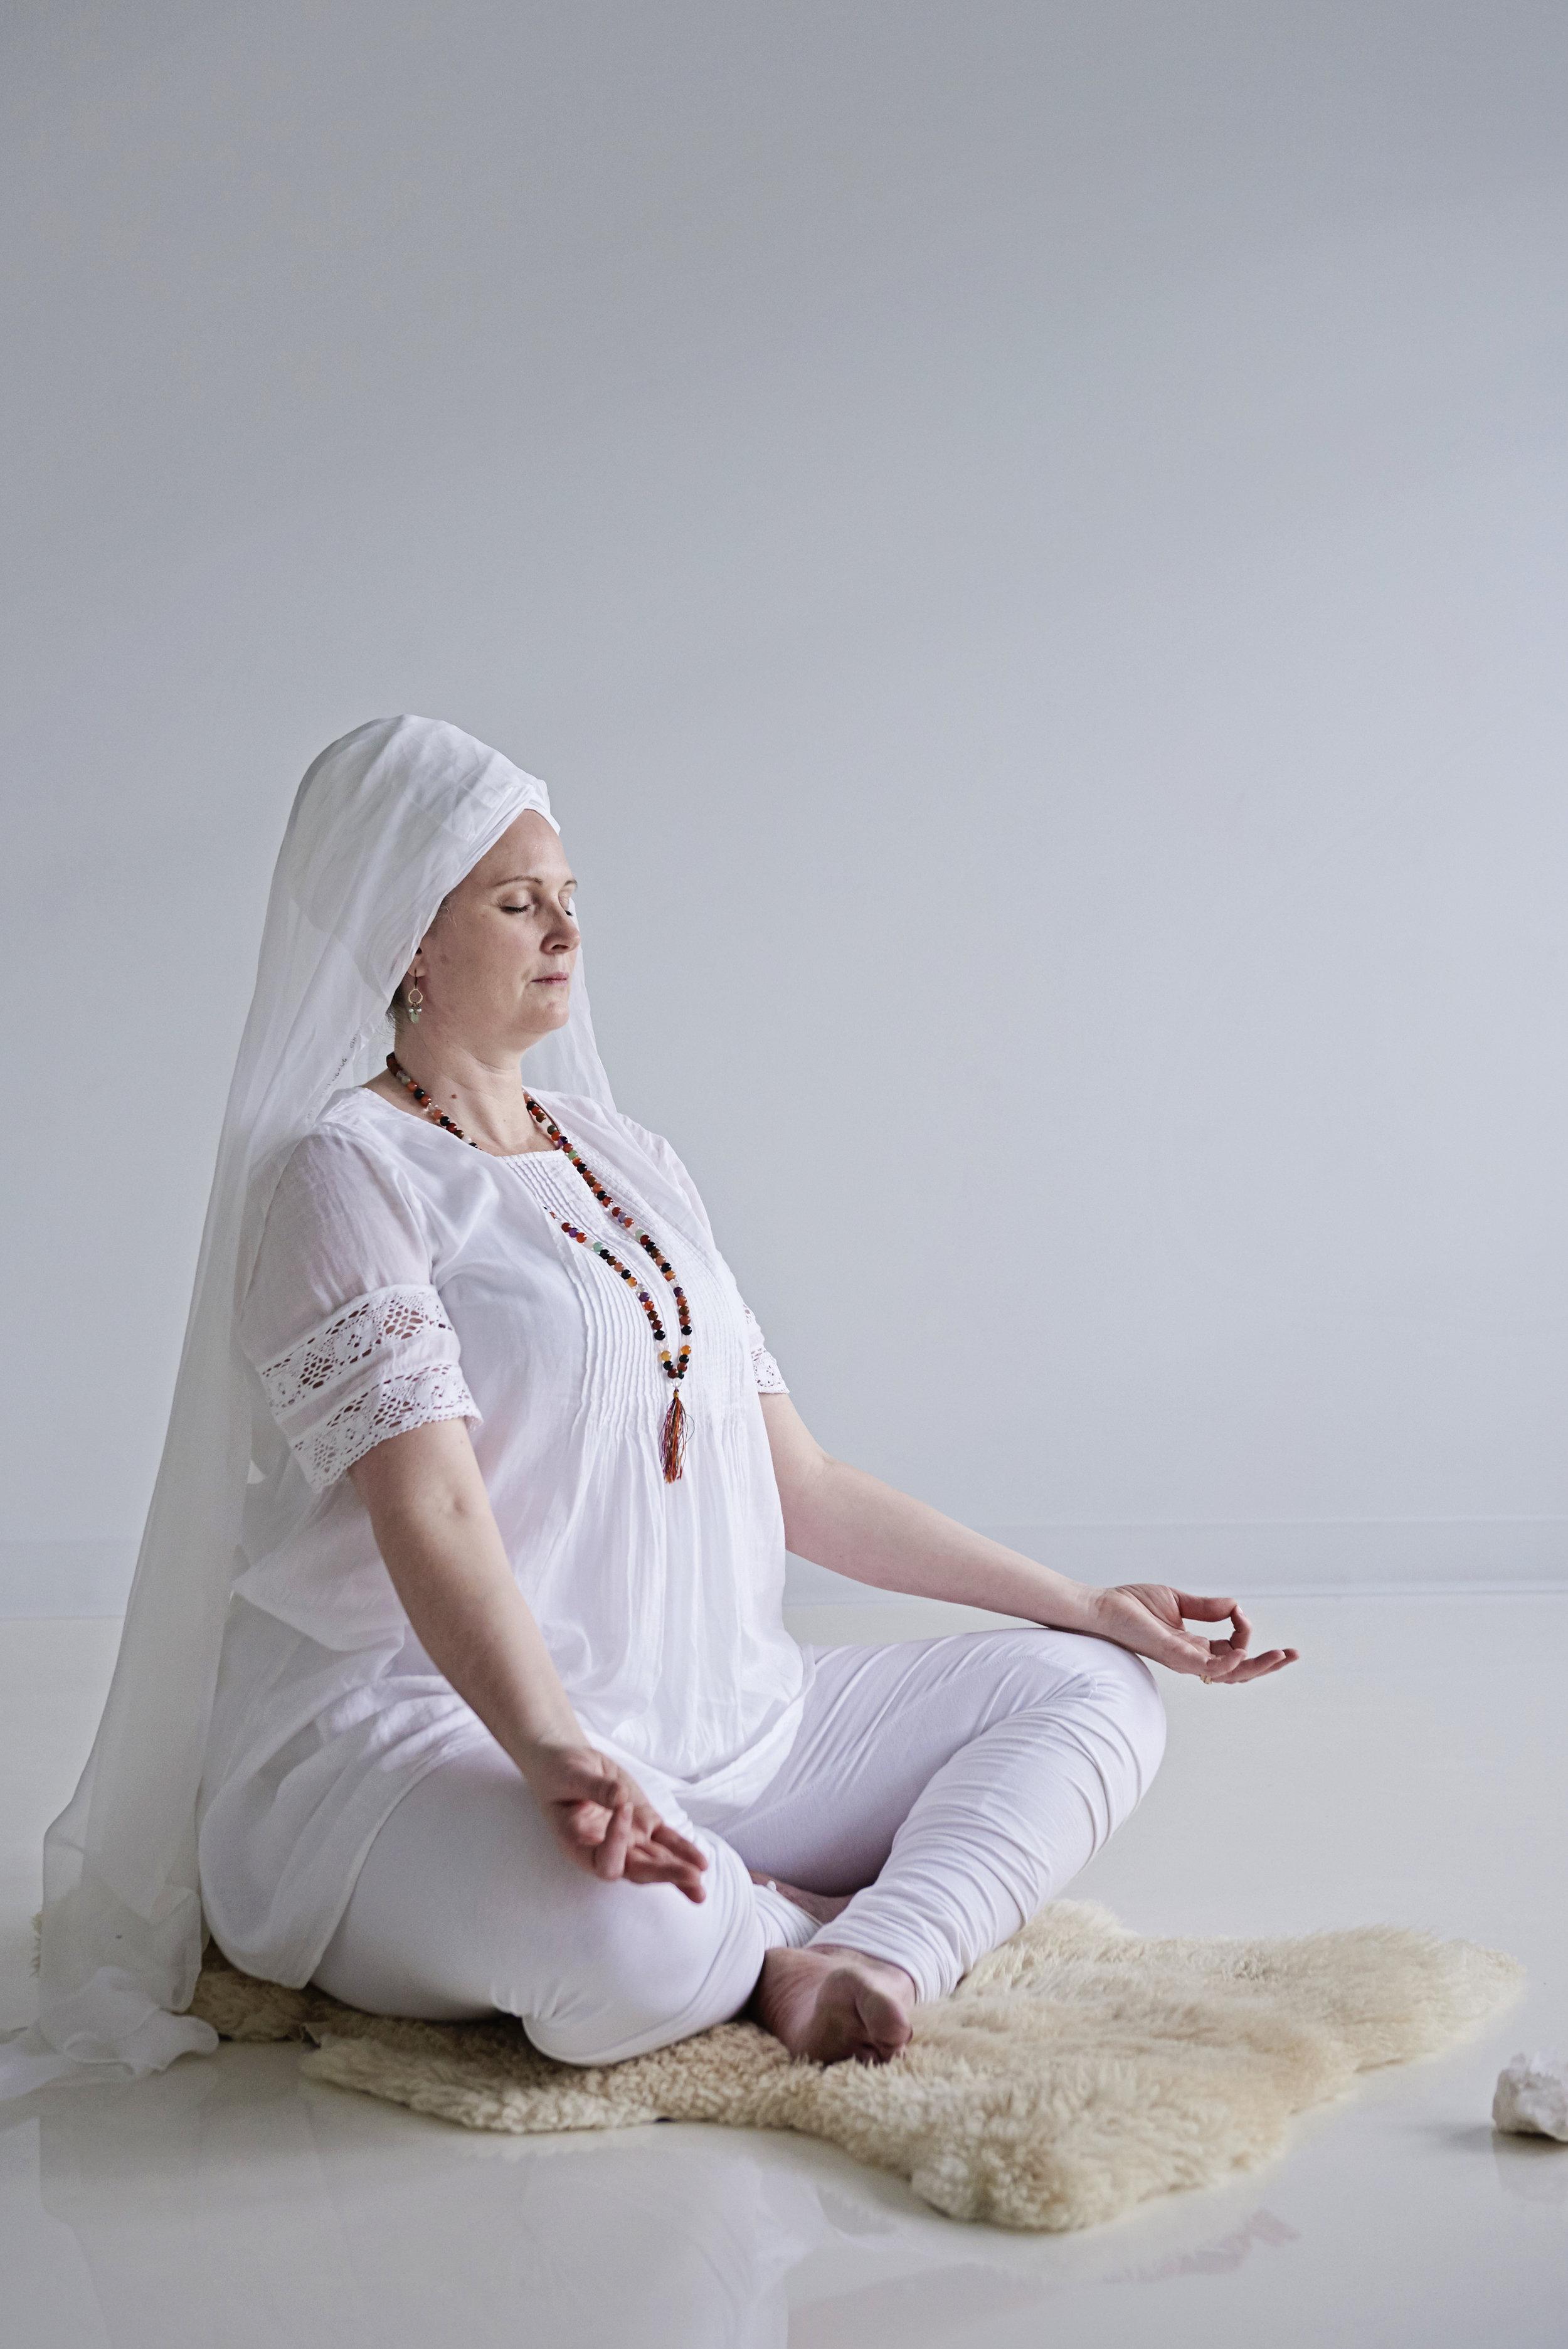 DSC_7598-kit-haven-yoga-and-wellness-abbotsford-yoga-Kundalini-Yoga-class.jpg